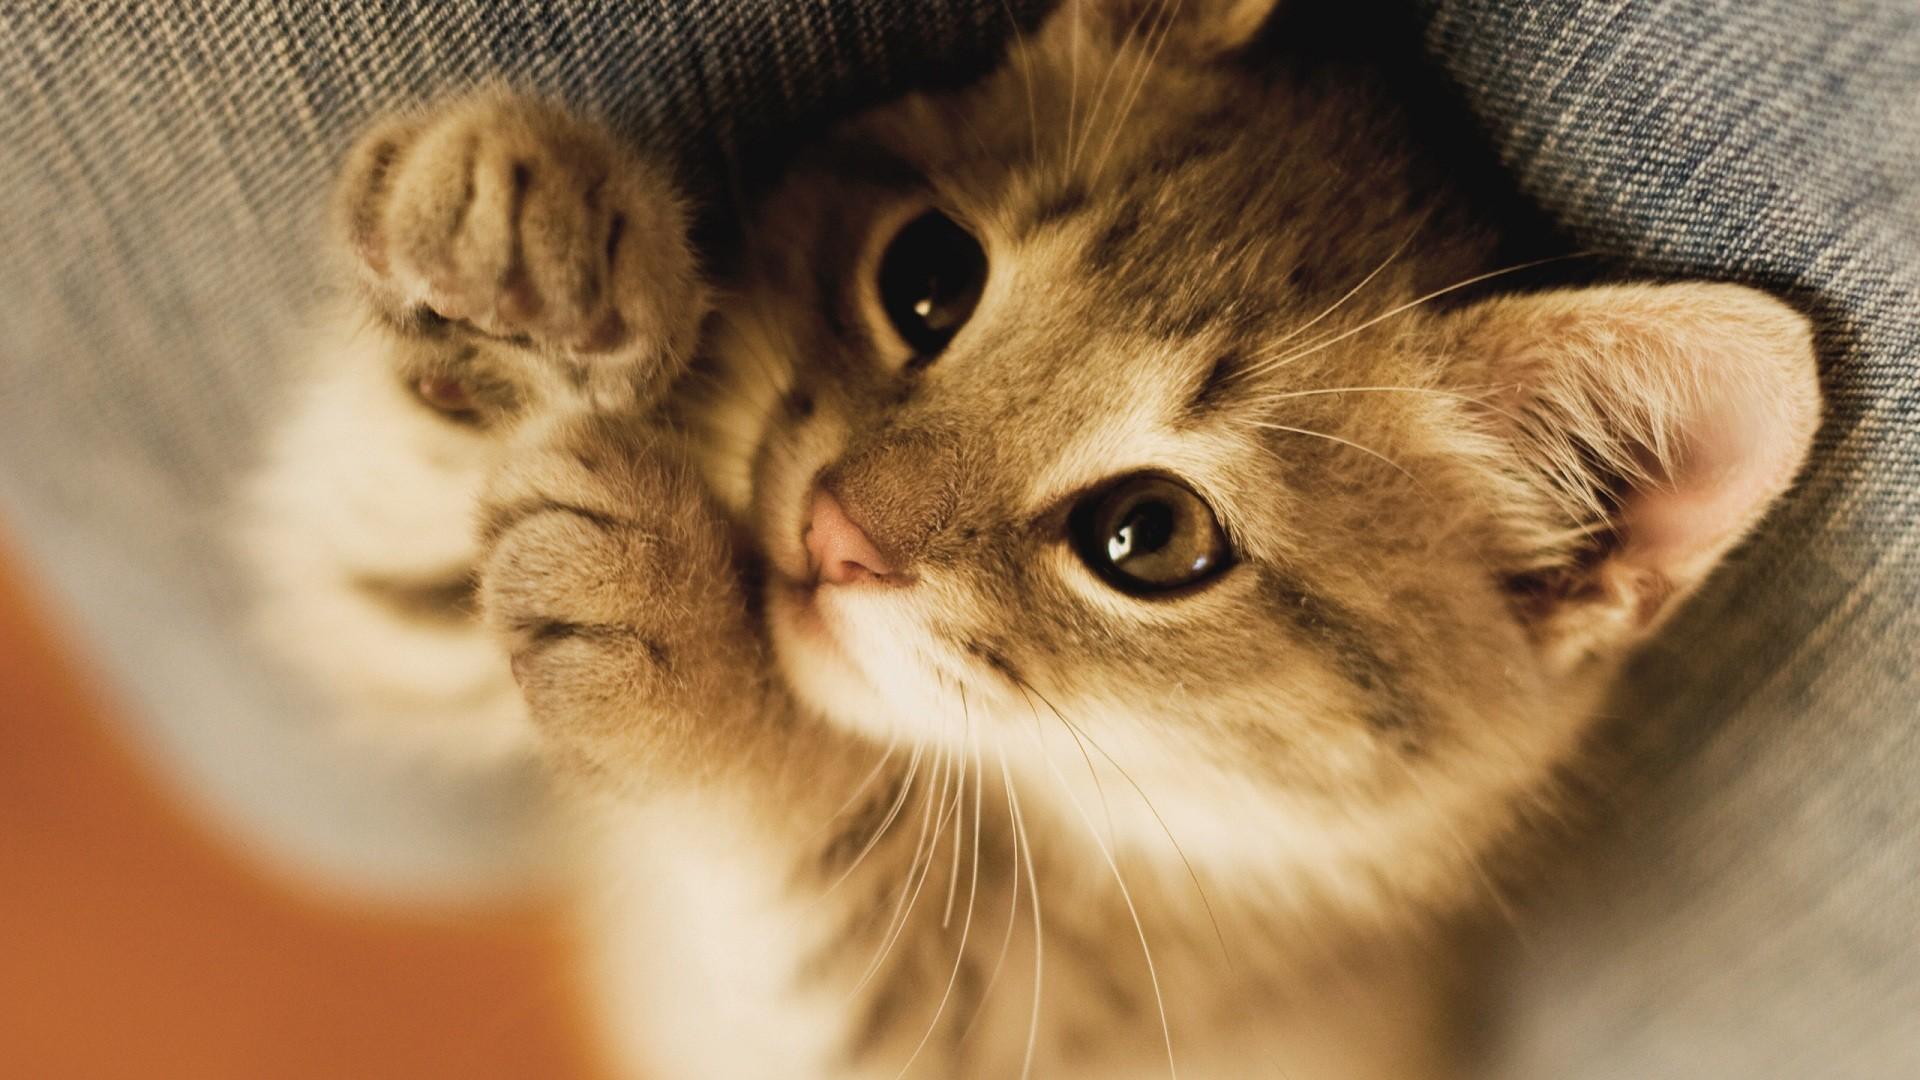 Full HD p Cat Wallpapers HD, Desktop Backgrounds Cat Wallpapers Wallpapers)